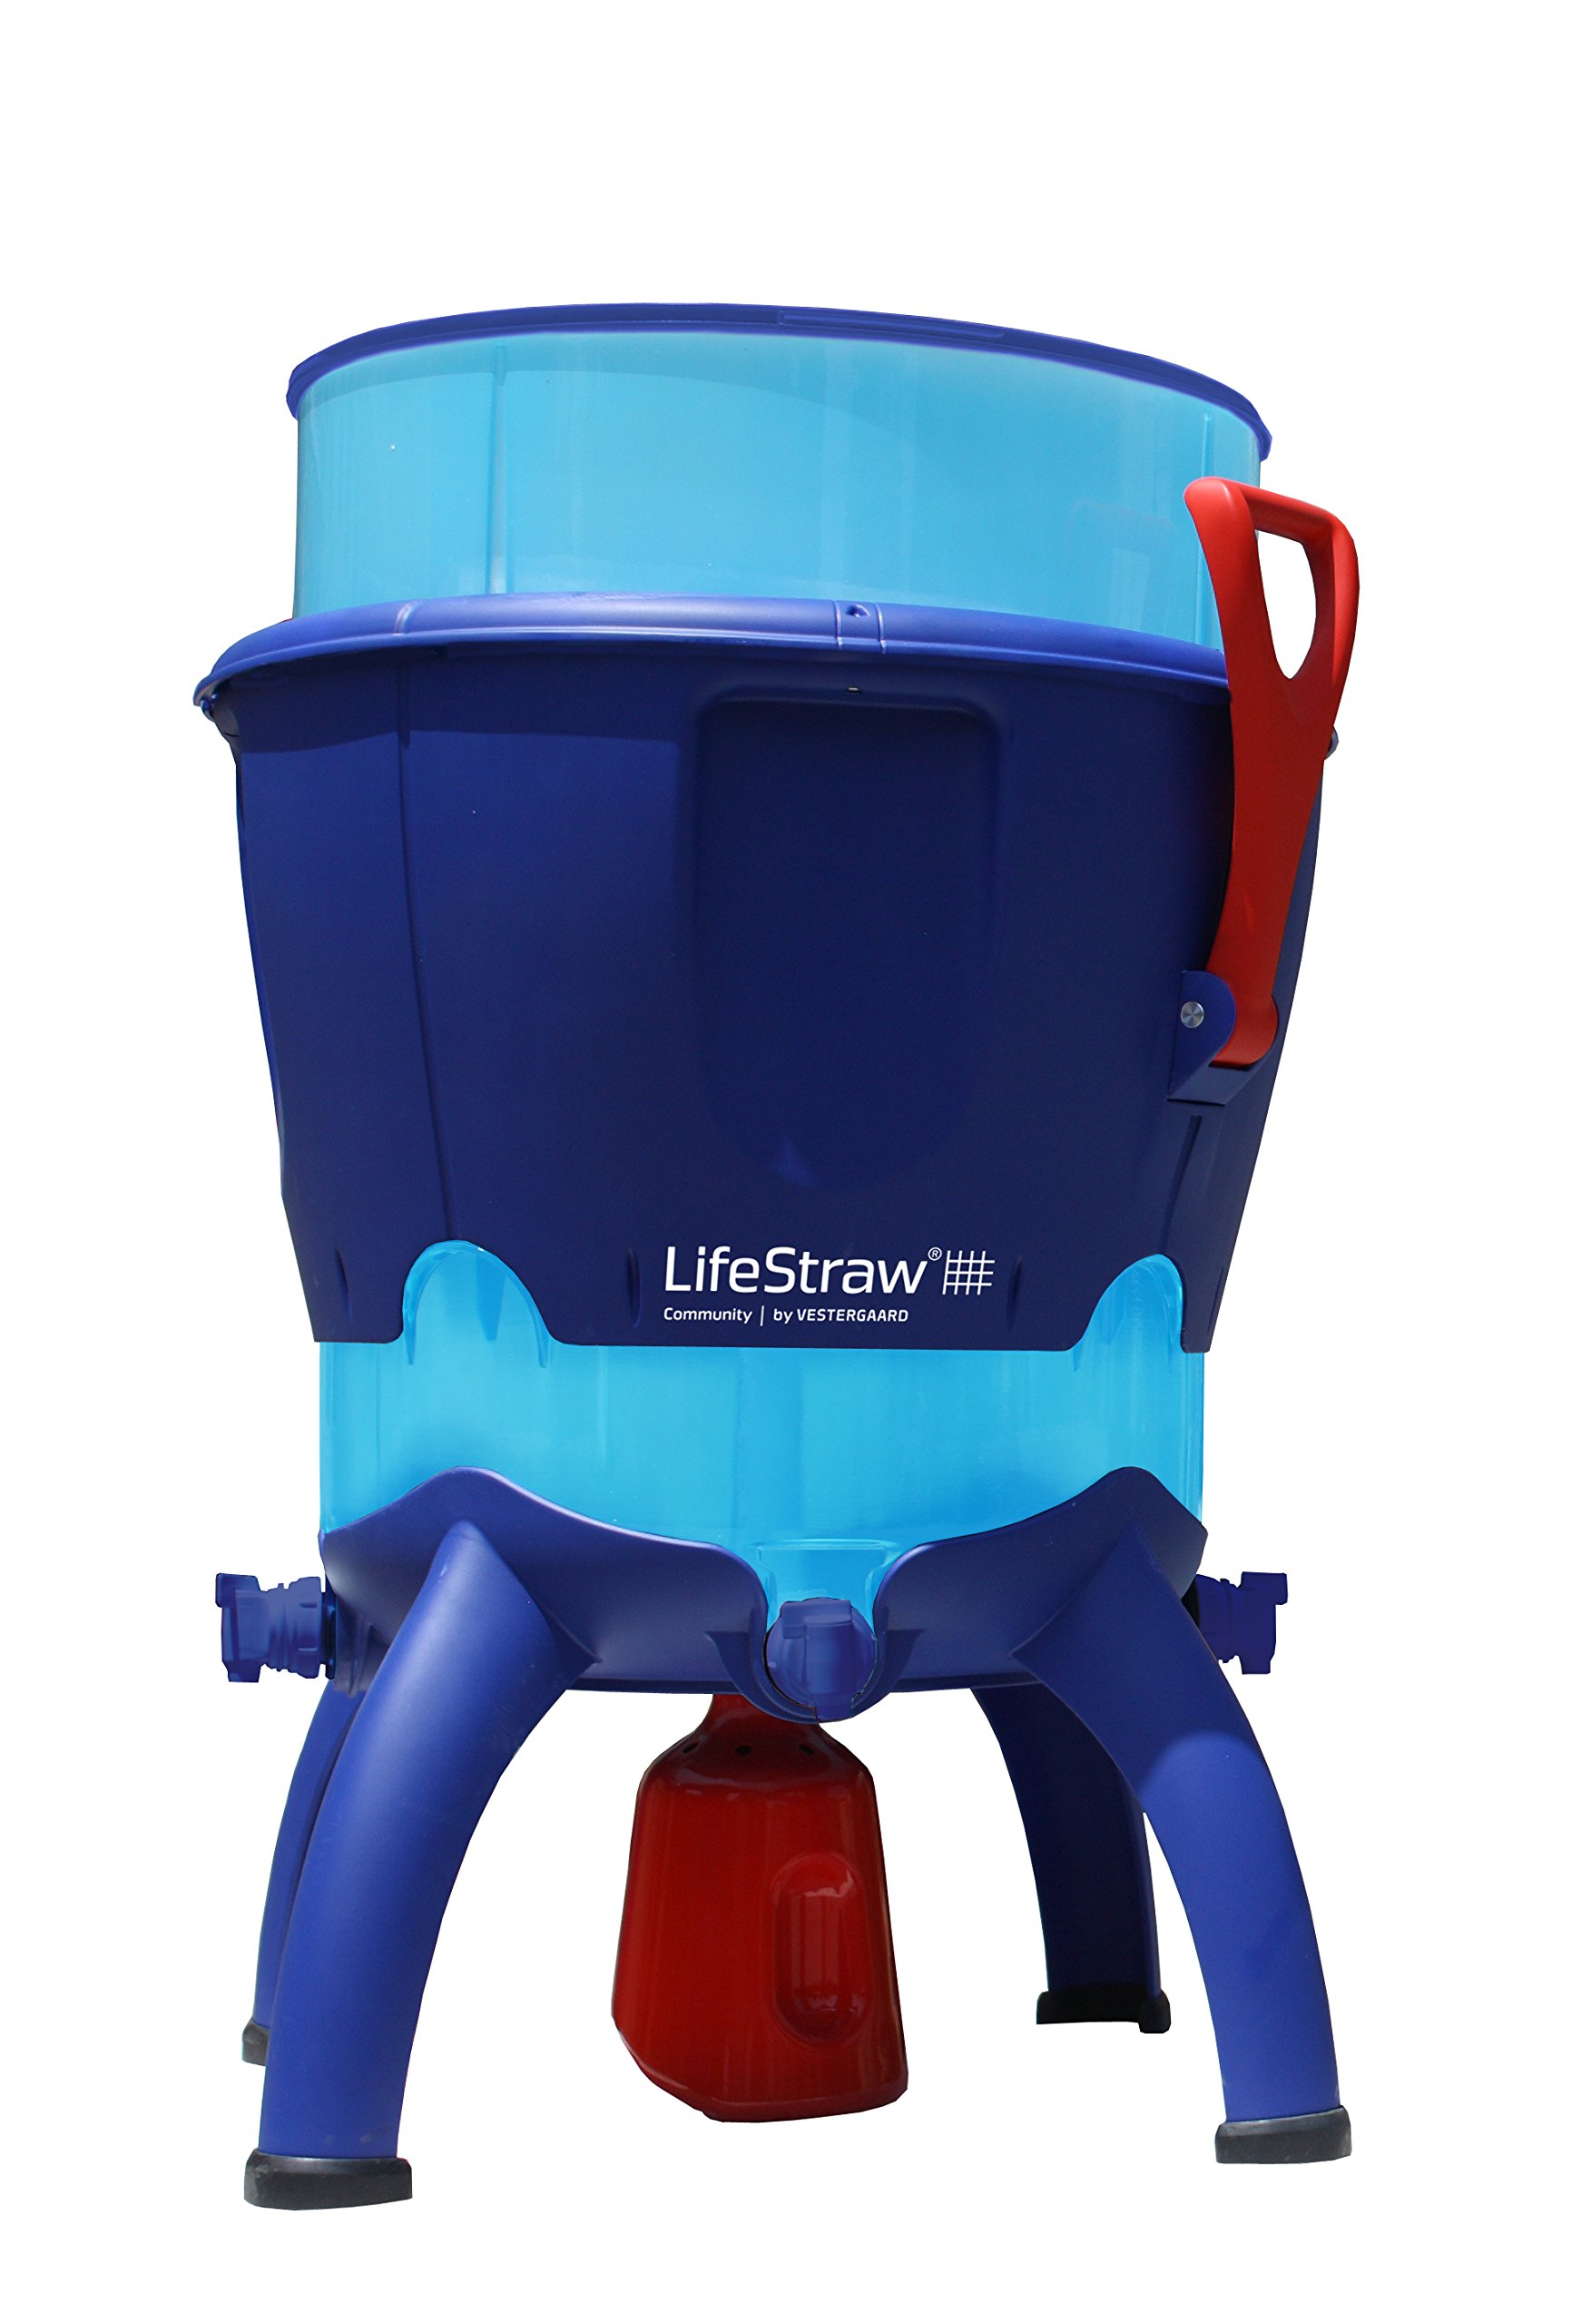 LifeStraw Community Hollow fiber filter